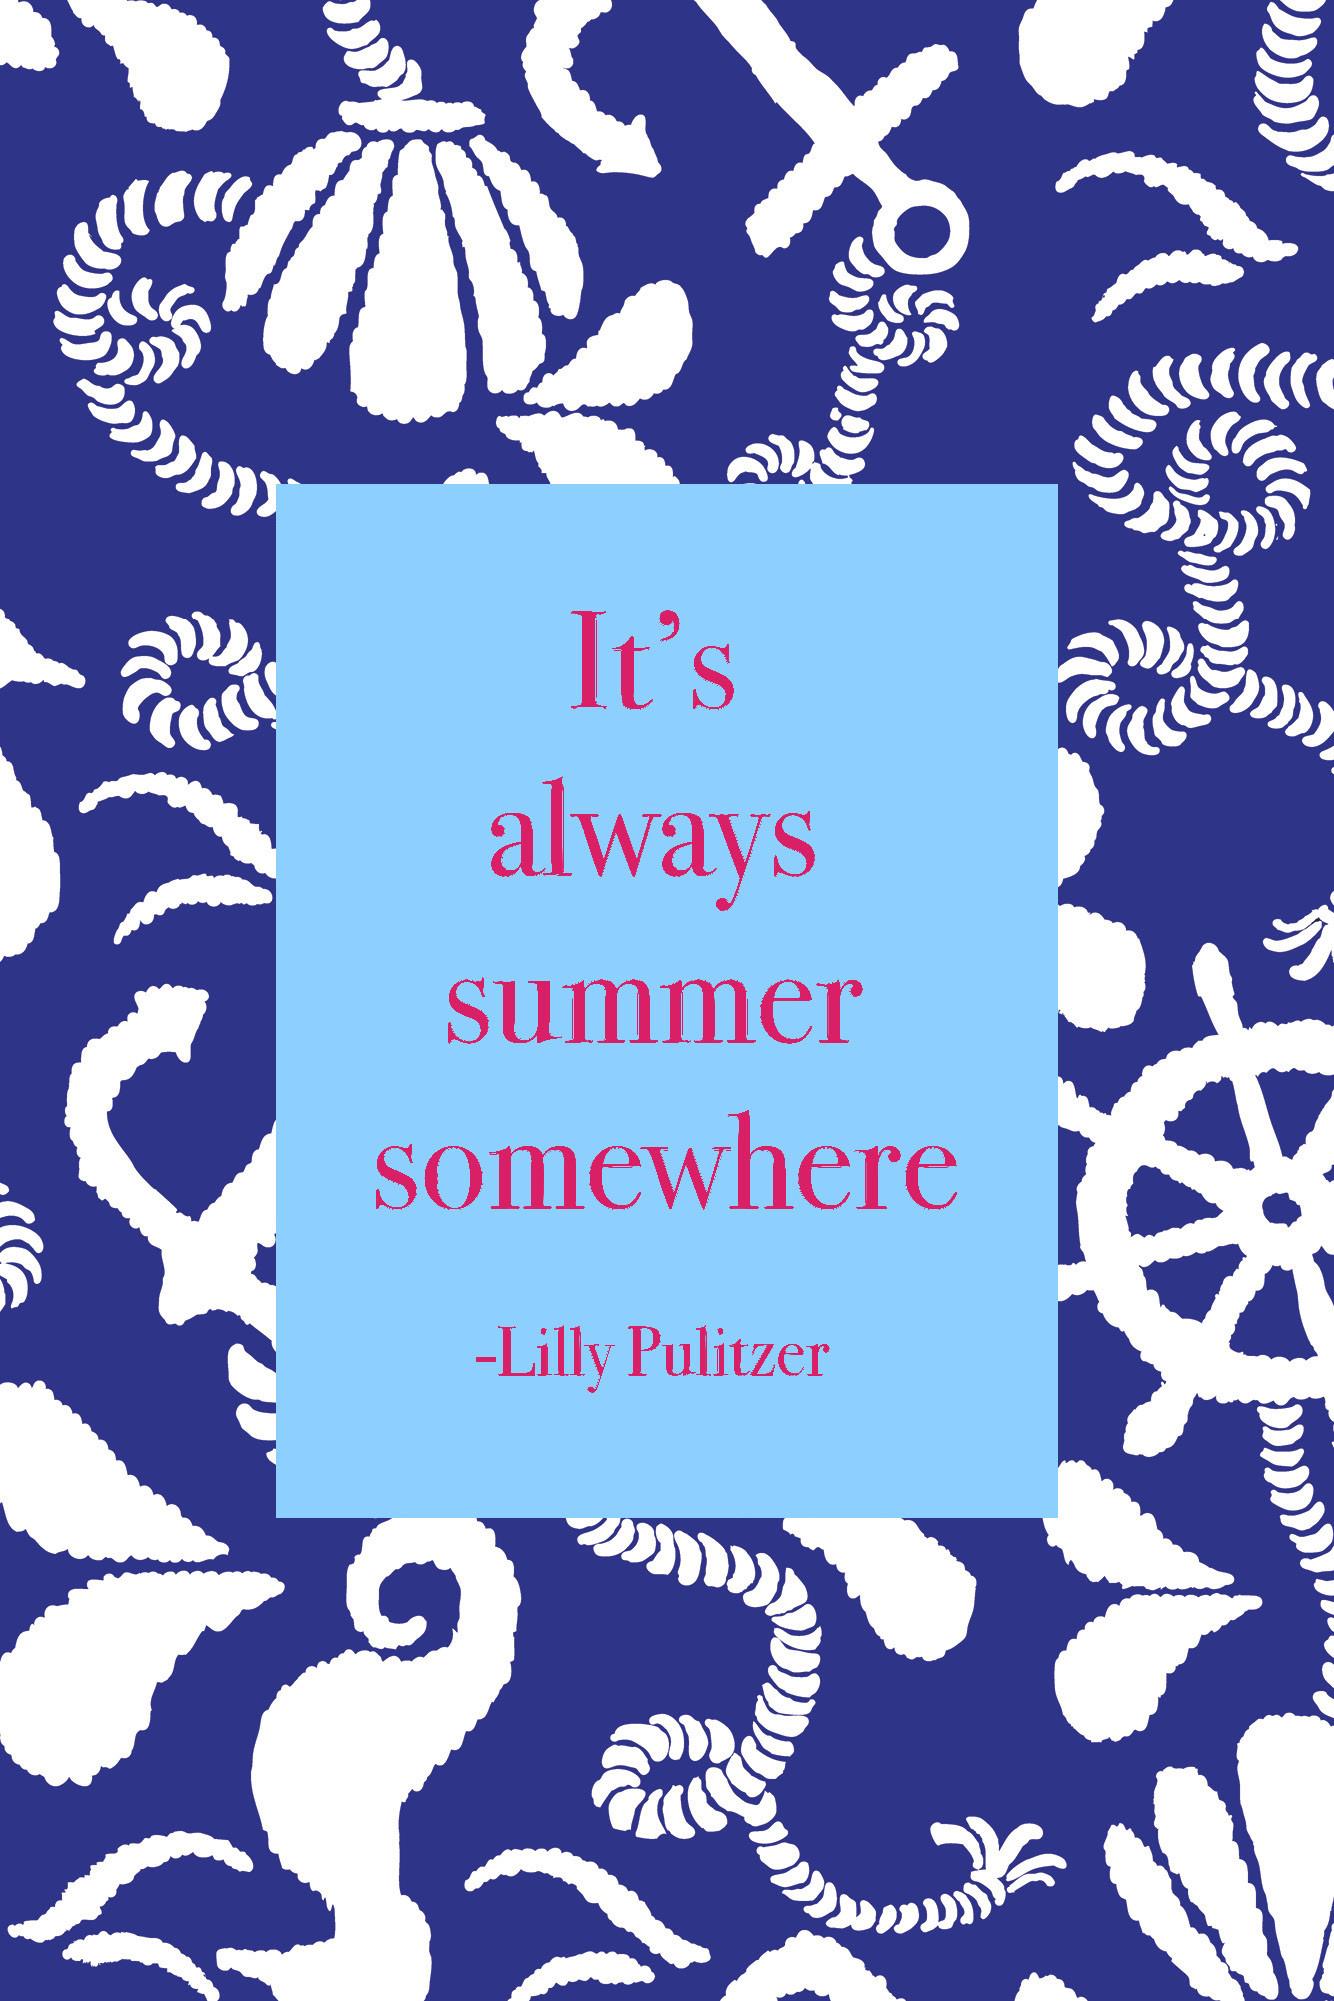 Lily Pulitzer Starbucks Monogram Lilly Pulitzer Desktop Wallpaper 38 Images